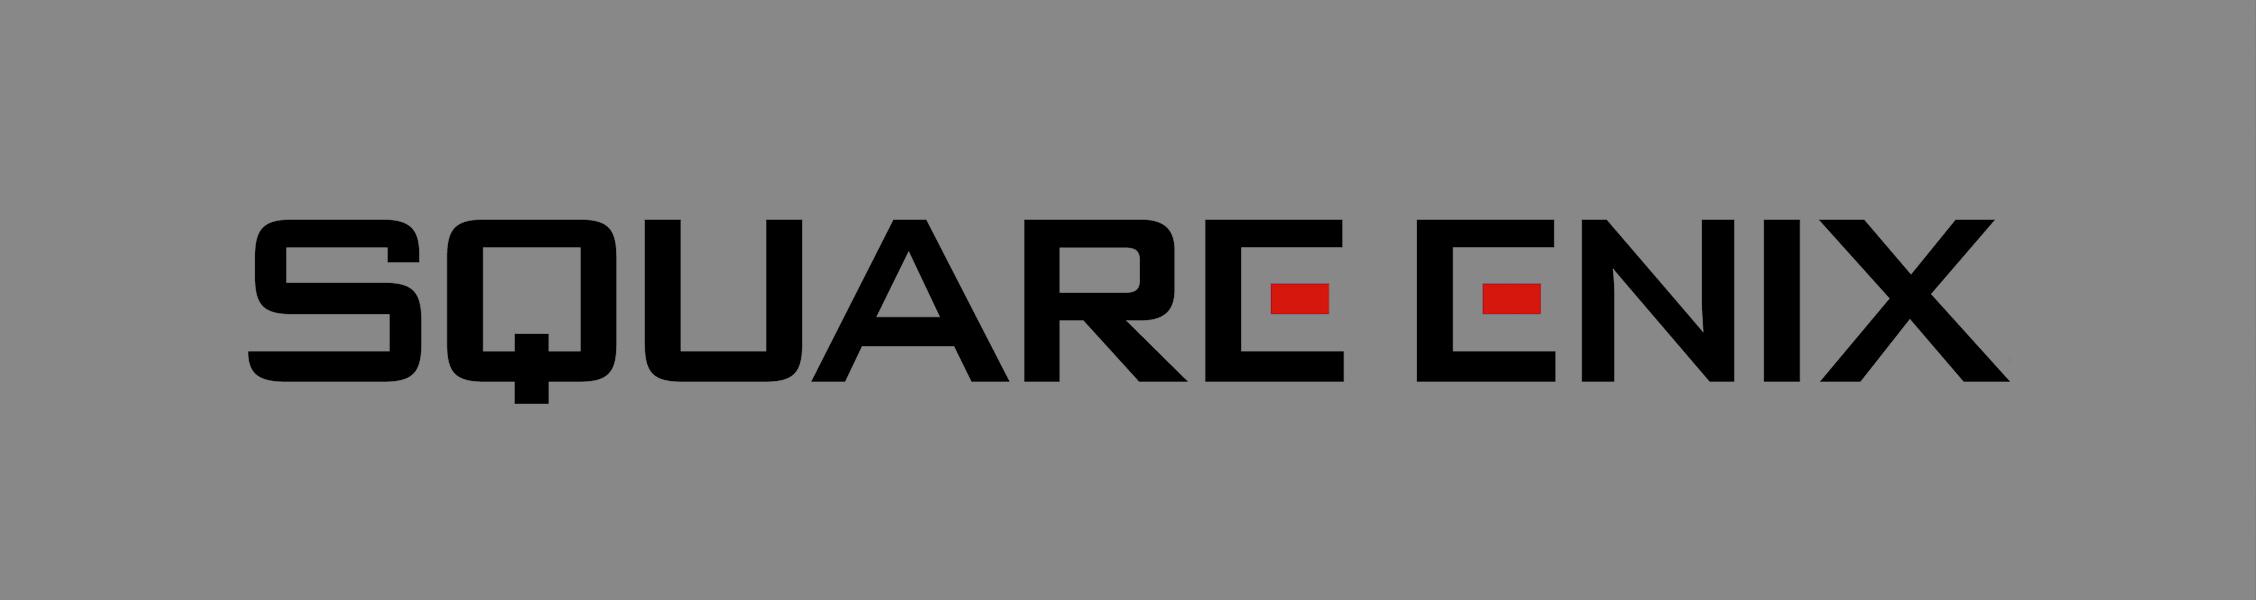 square-enix-banner